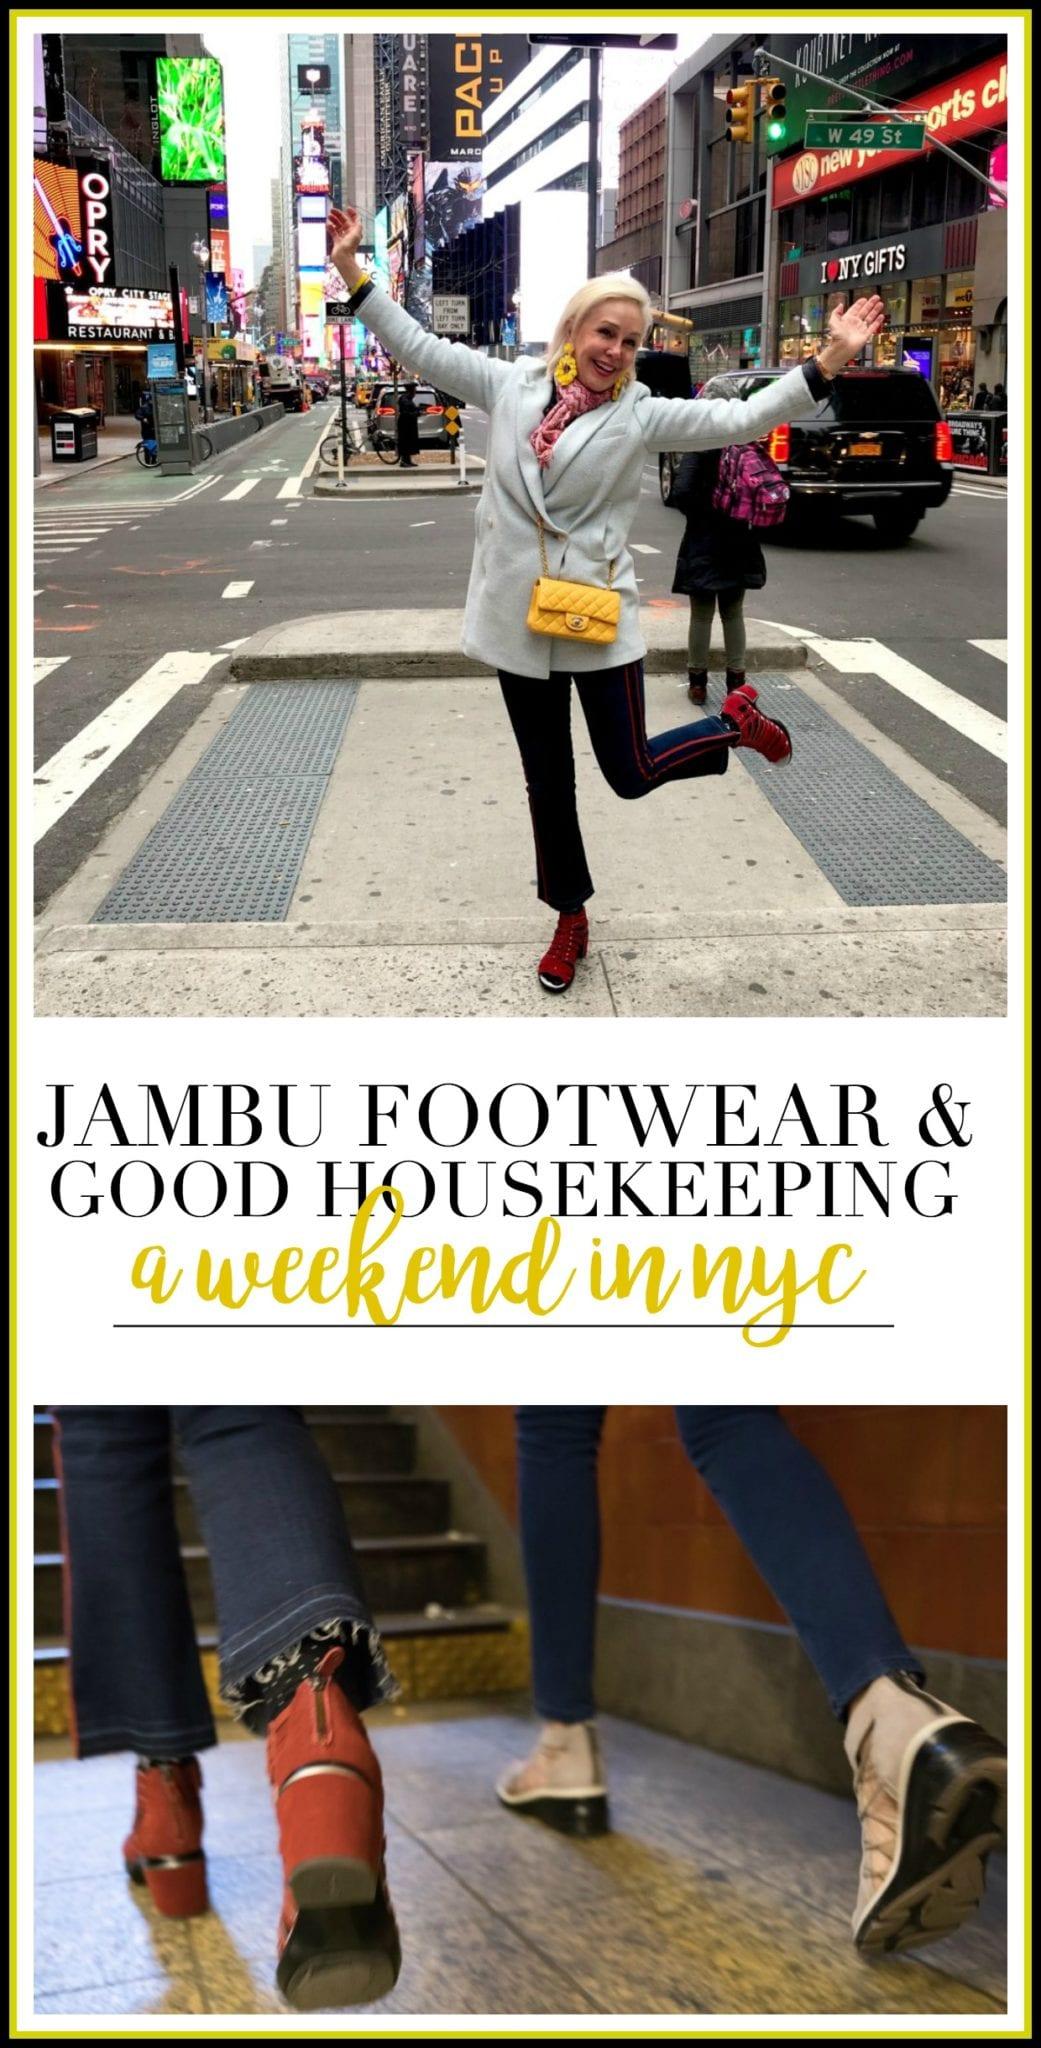 bloggers Good Housekeeping GooD Housekeeping tour Hearst Corporation Jambu footwear lifestyle footwear New York City